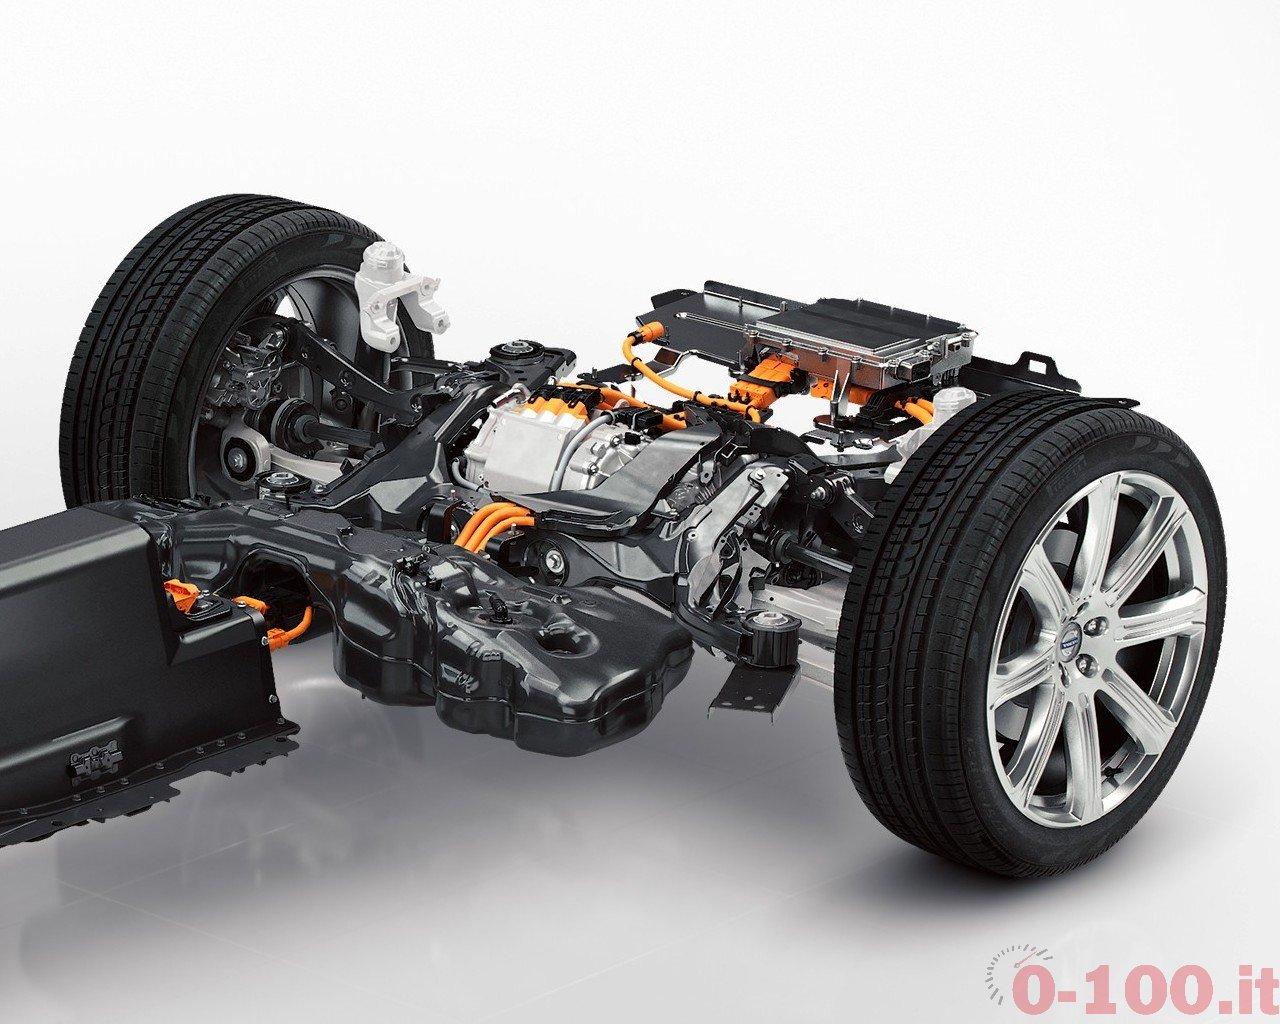 volvo-xc90-t8-d5-d4-hybrid-0-100_6